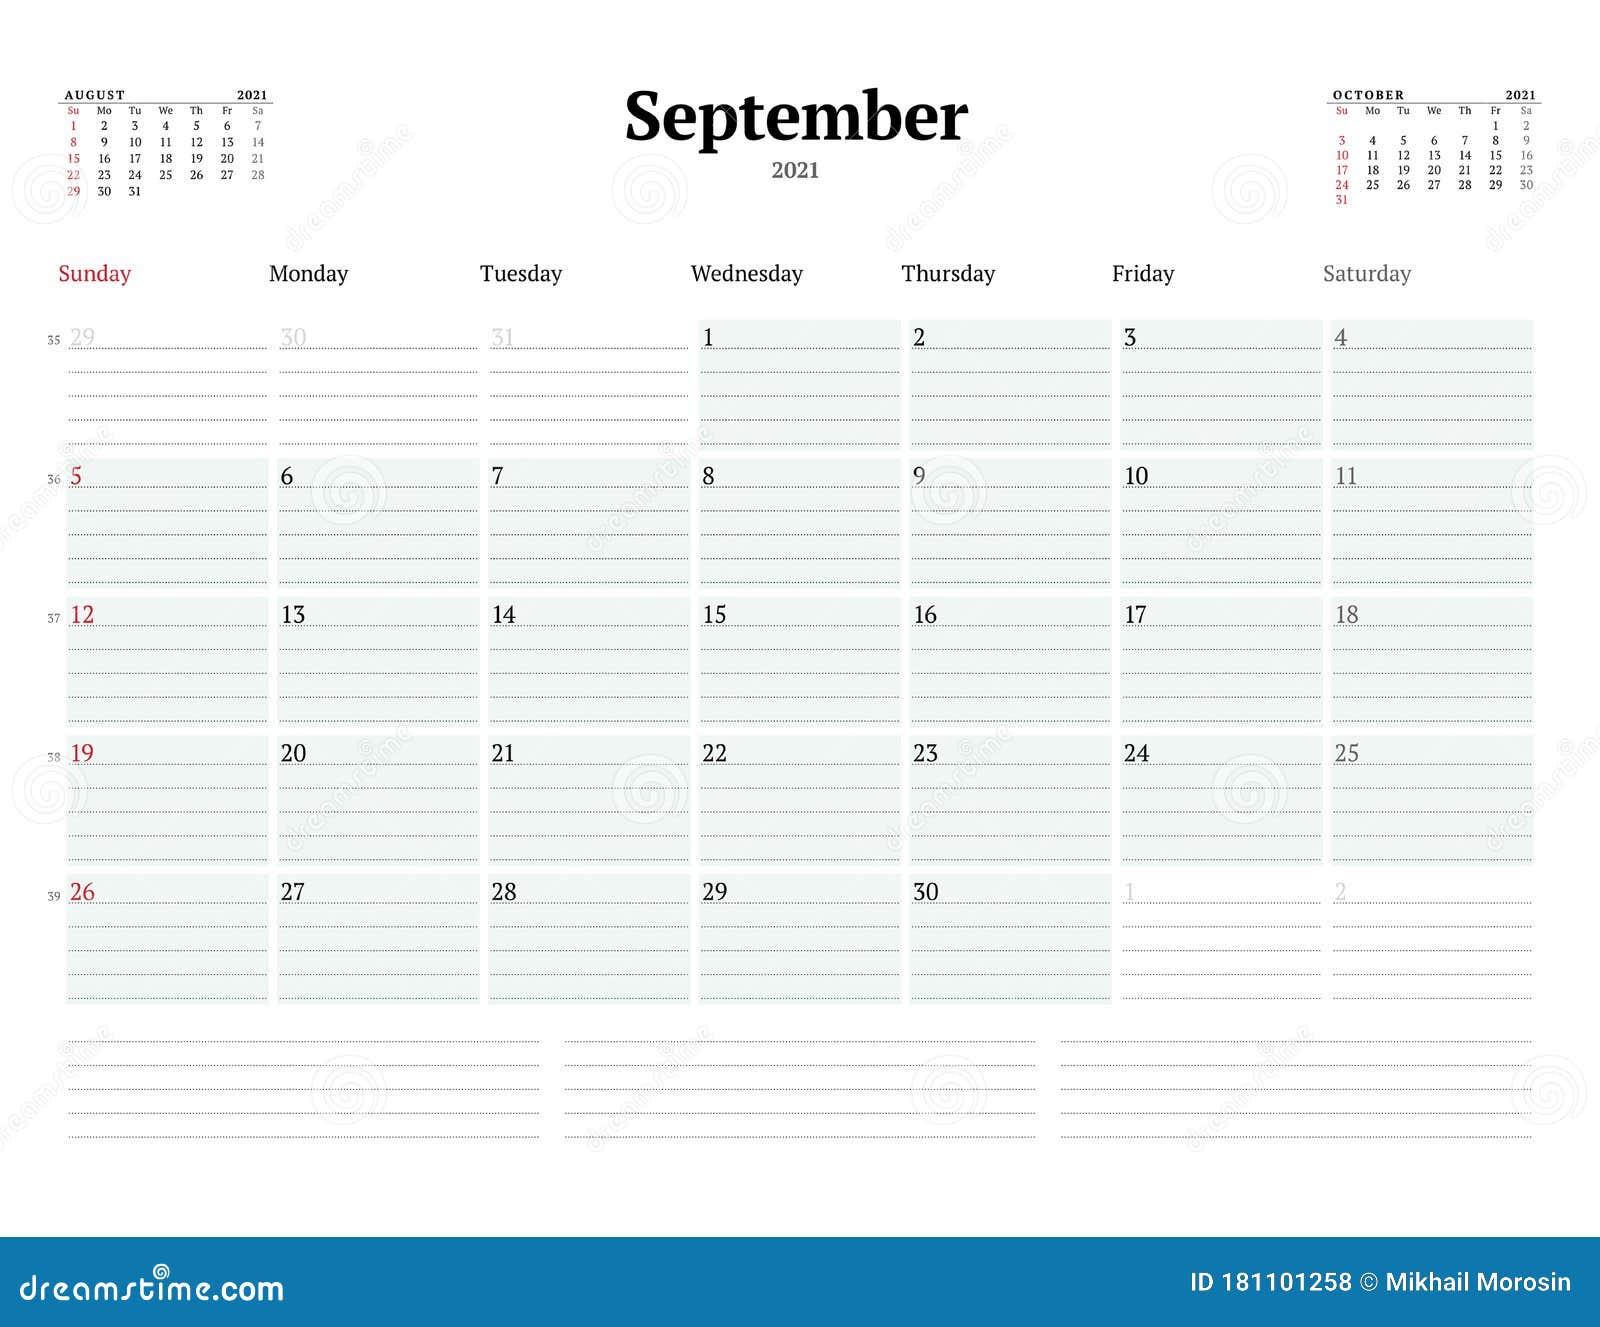 Calendar Template For September 2021 Business Monthly Planner Stationery Design Week Starts On Sunday Stock Illustration Illustration Of Numbers Monday 181101258